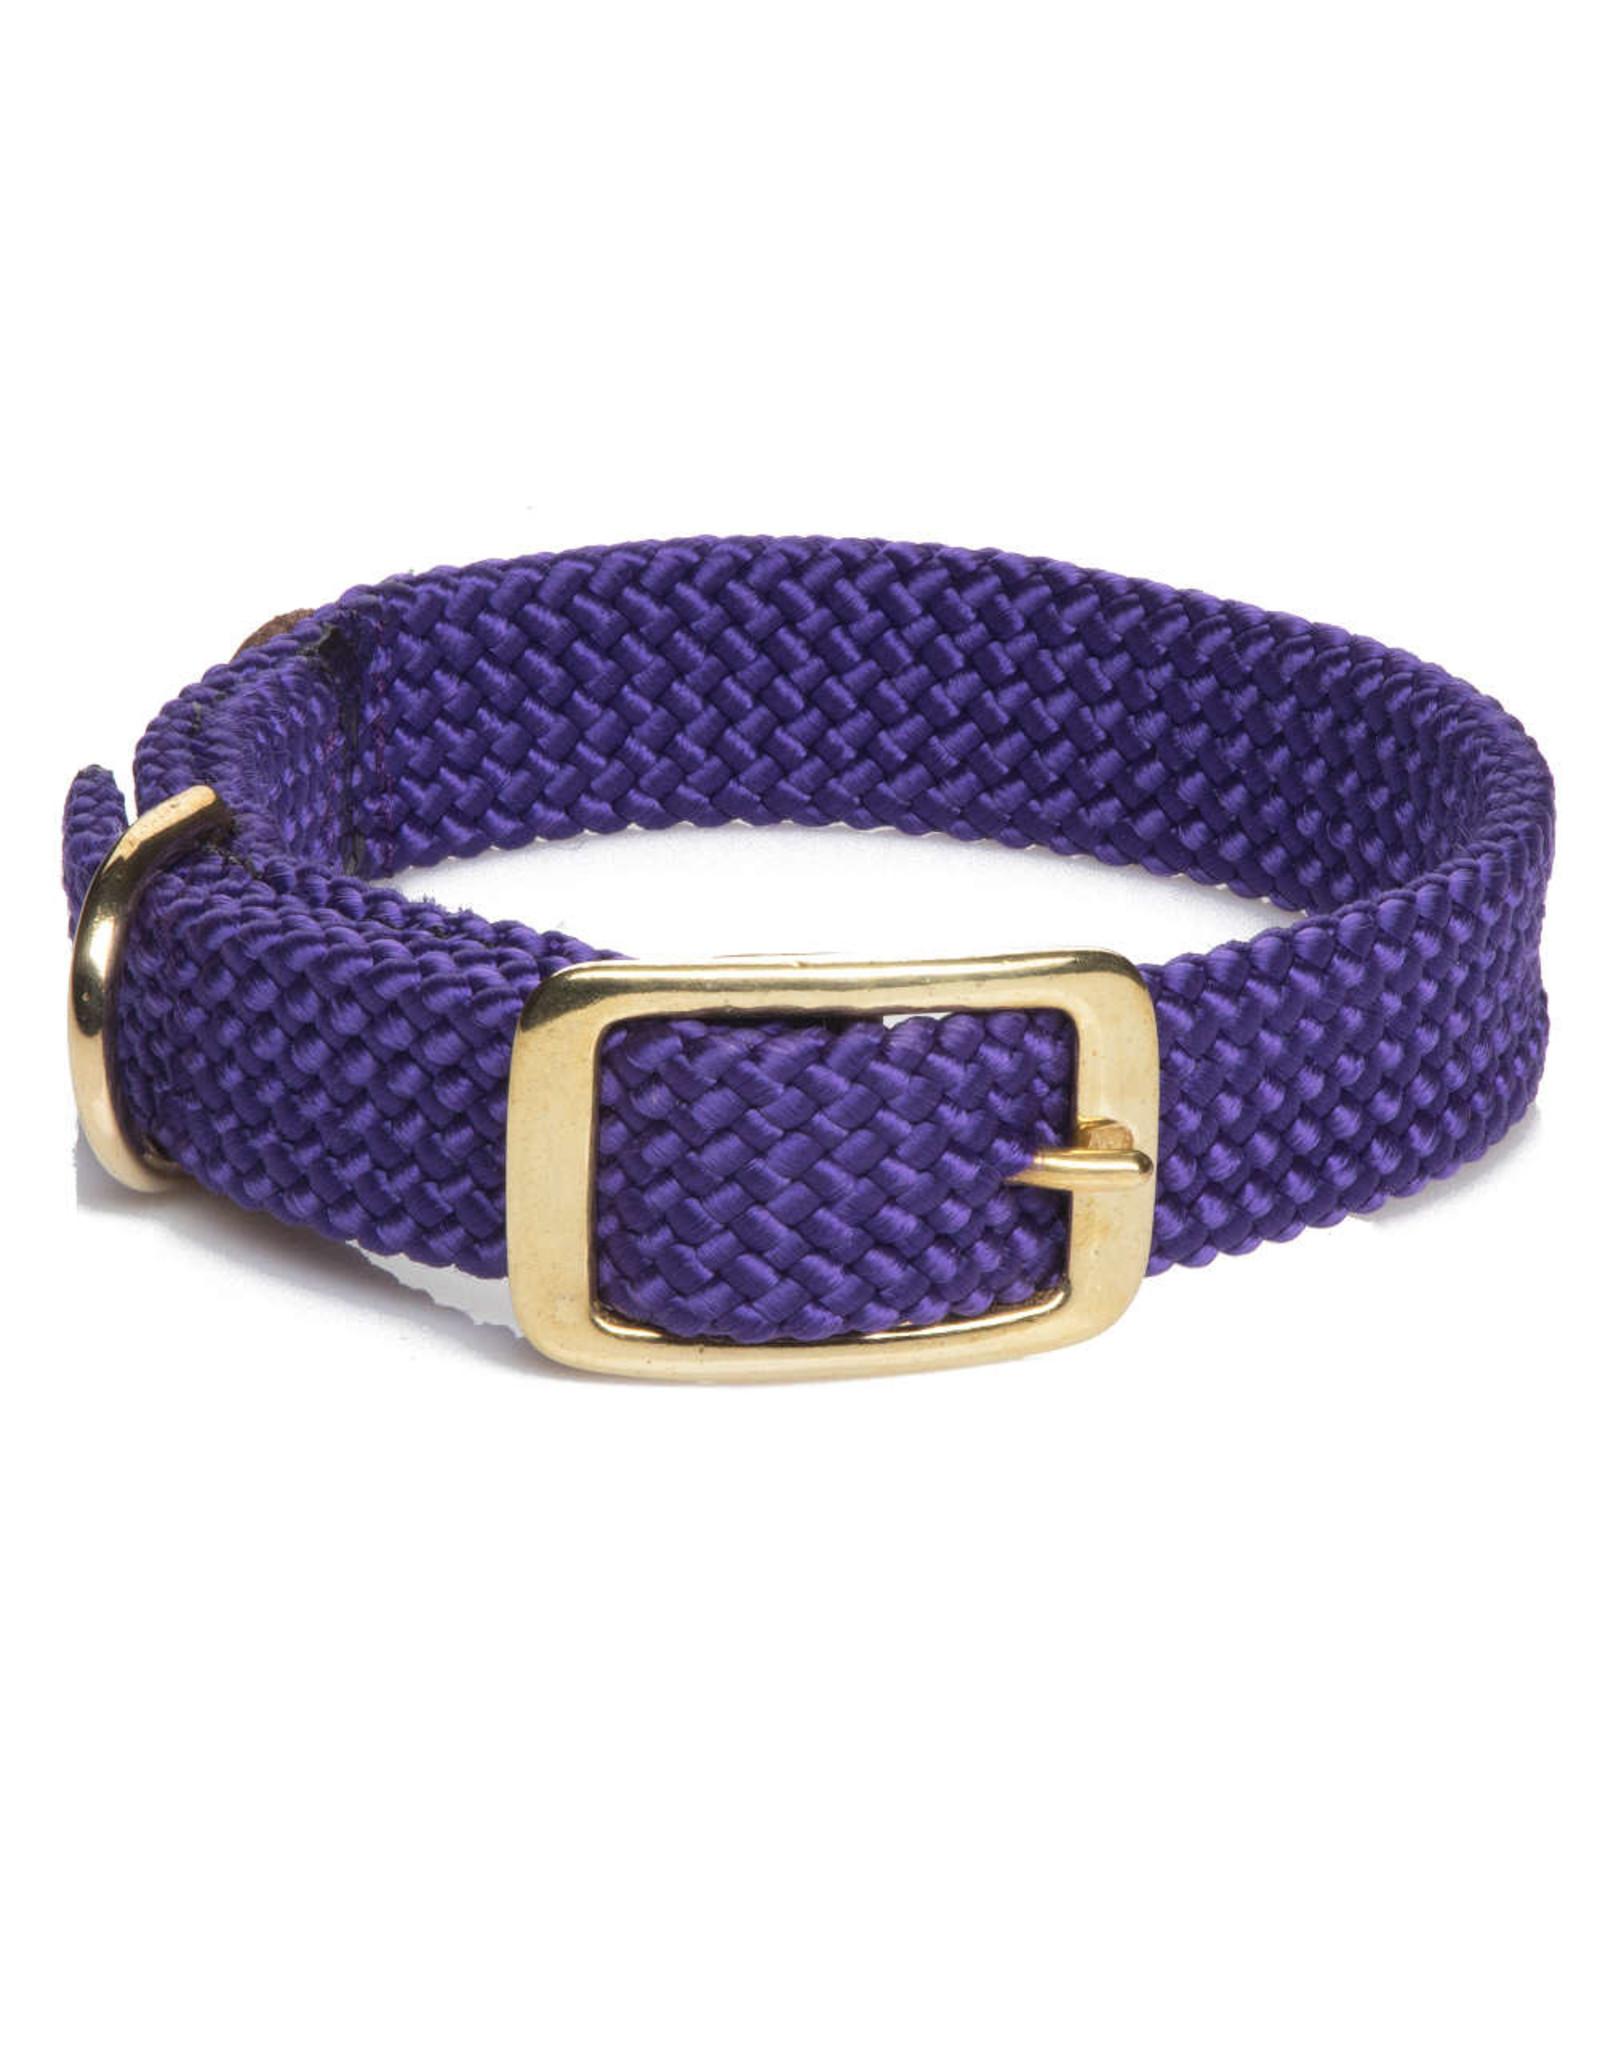 "Mendota Mendota Double-Braid Collar PURPLE 1""x18"""